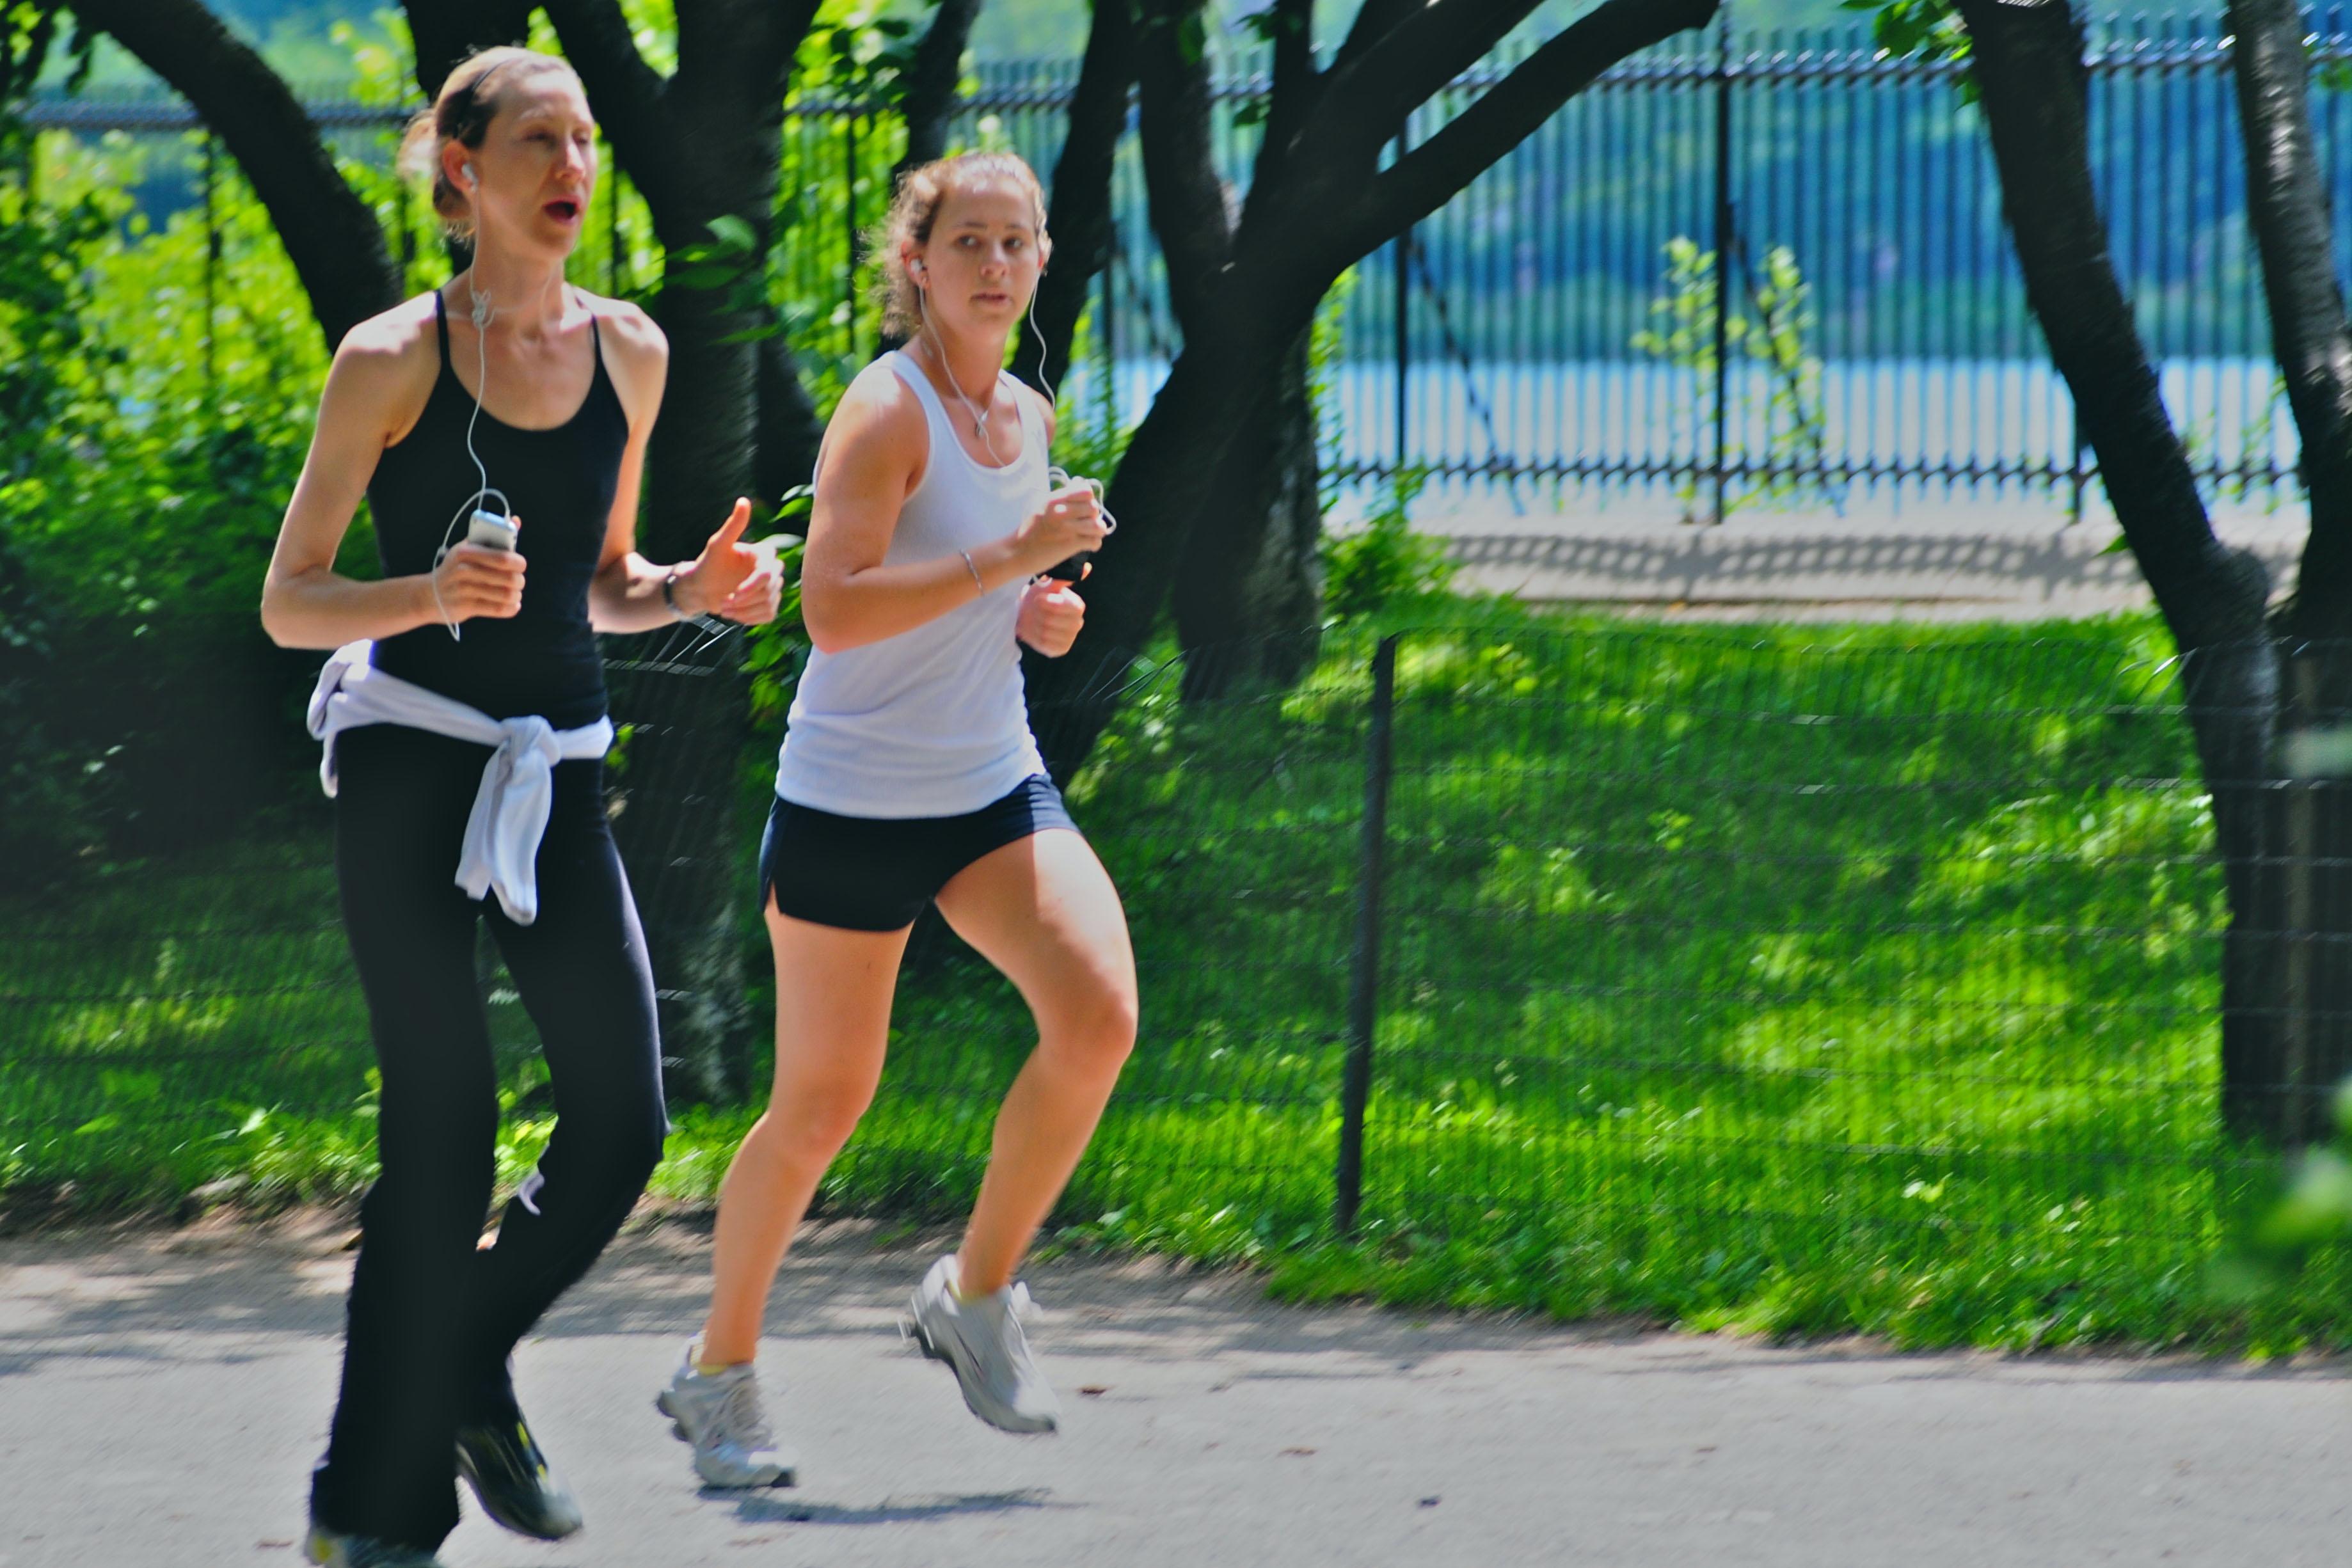 Jogging ladies at day